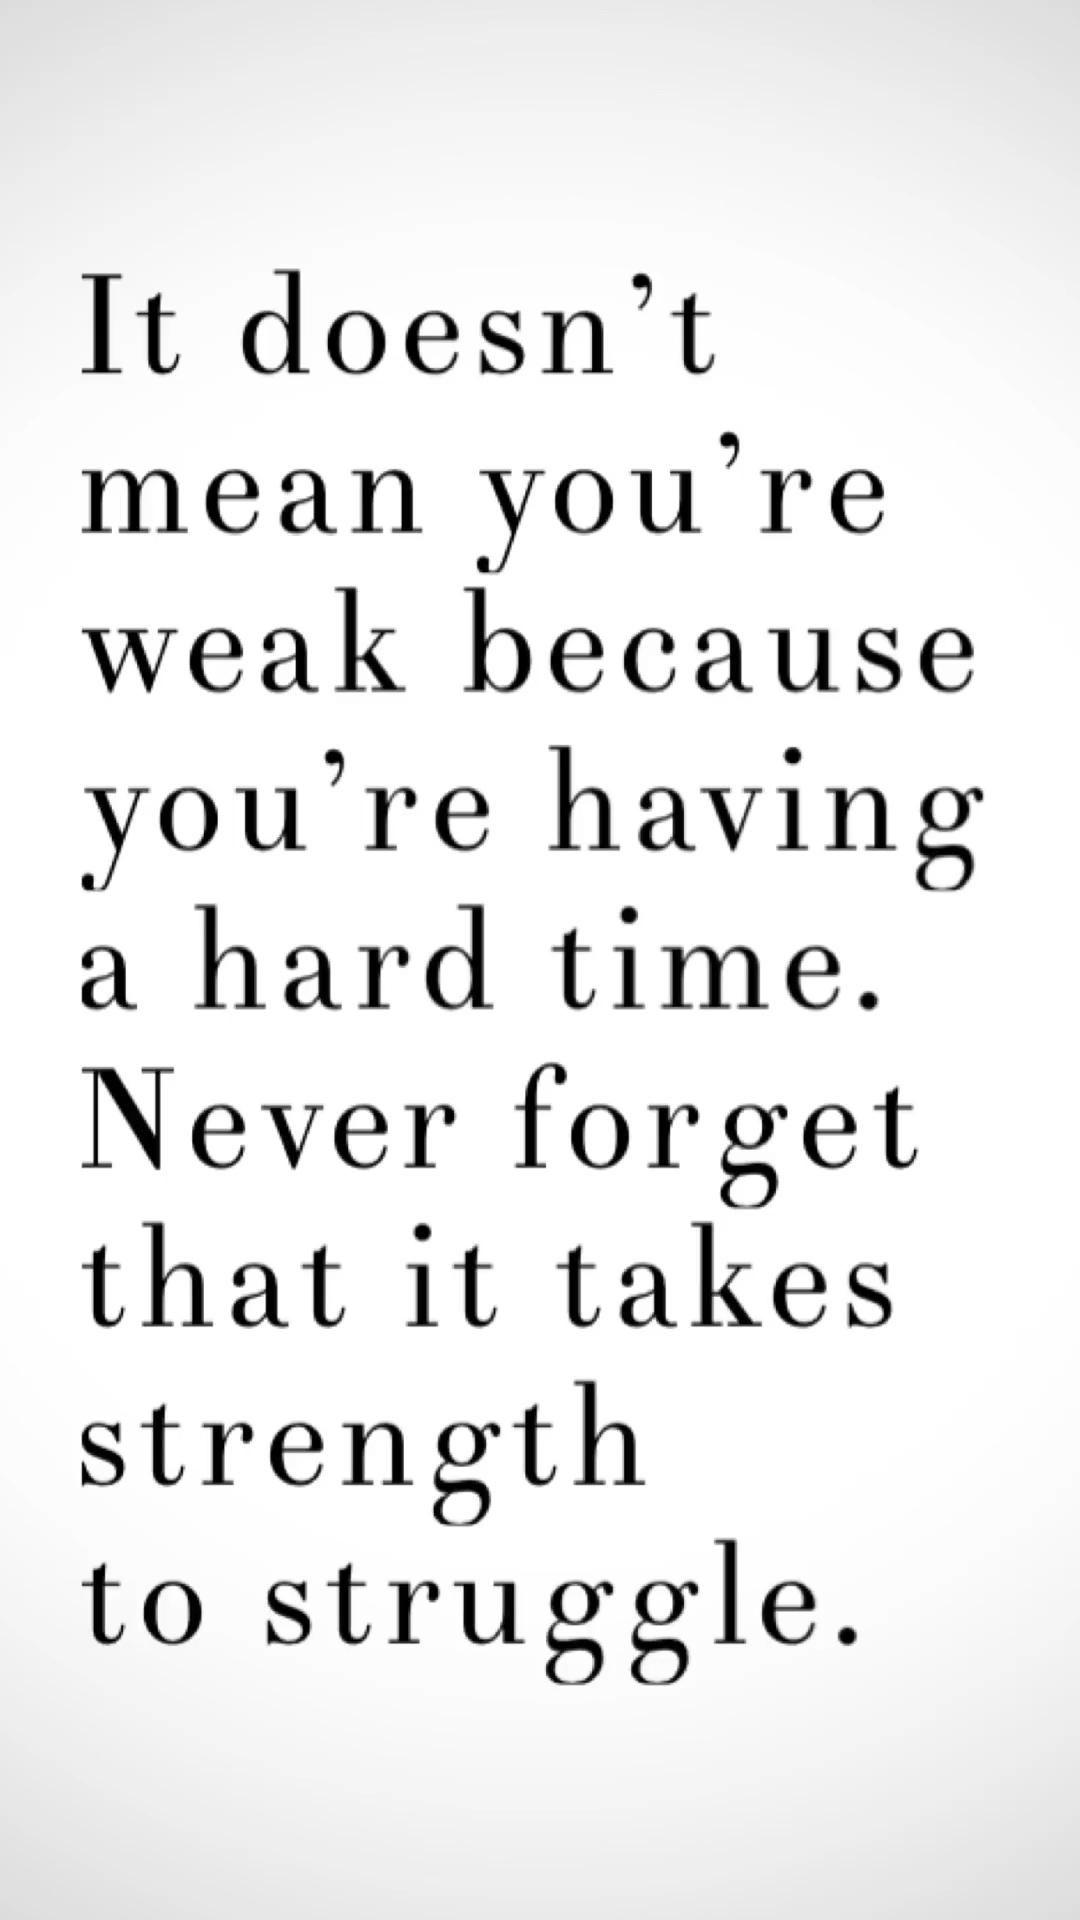 Motivational Inspirational Quotes